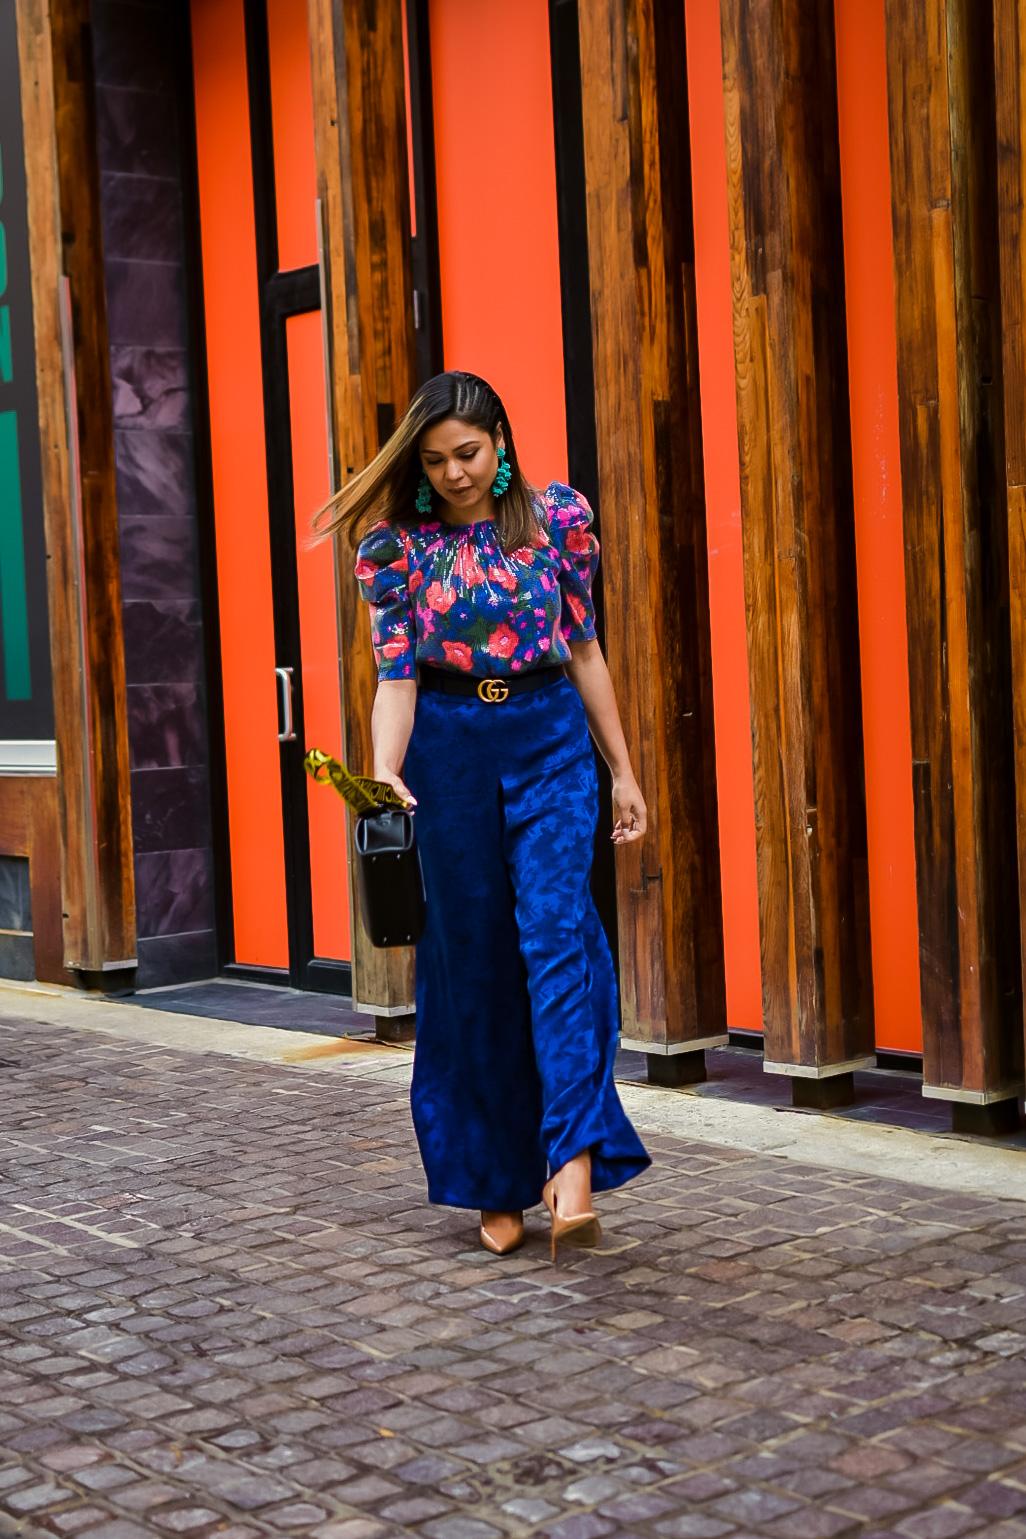 Monochromatic look, blue, sequin blouse, sachin and babi grape earrings, steve madden nude heels, broader hairstyle, gucci marmont belt. zara jacquard pants, myriad musings, saumya shiohare